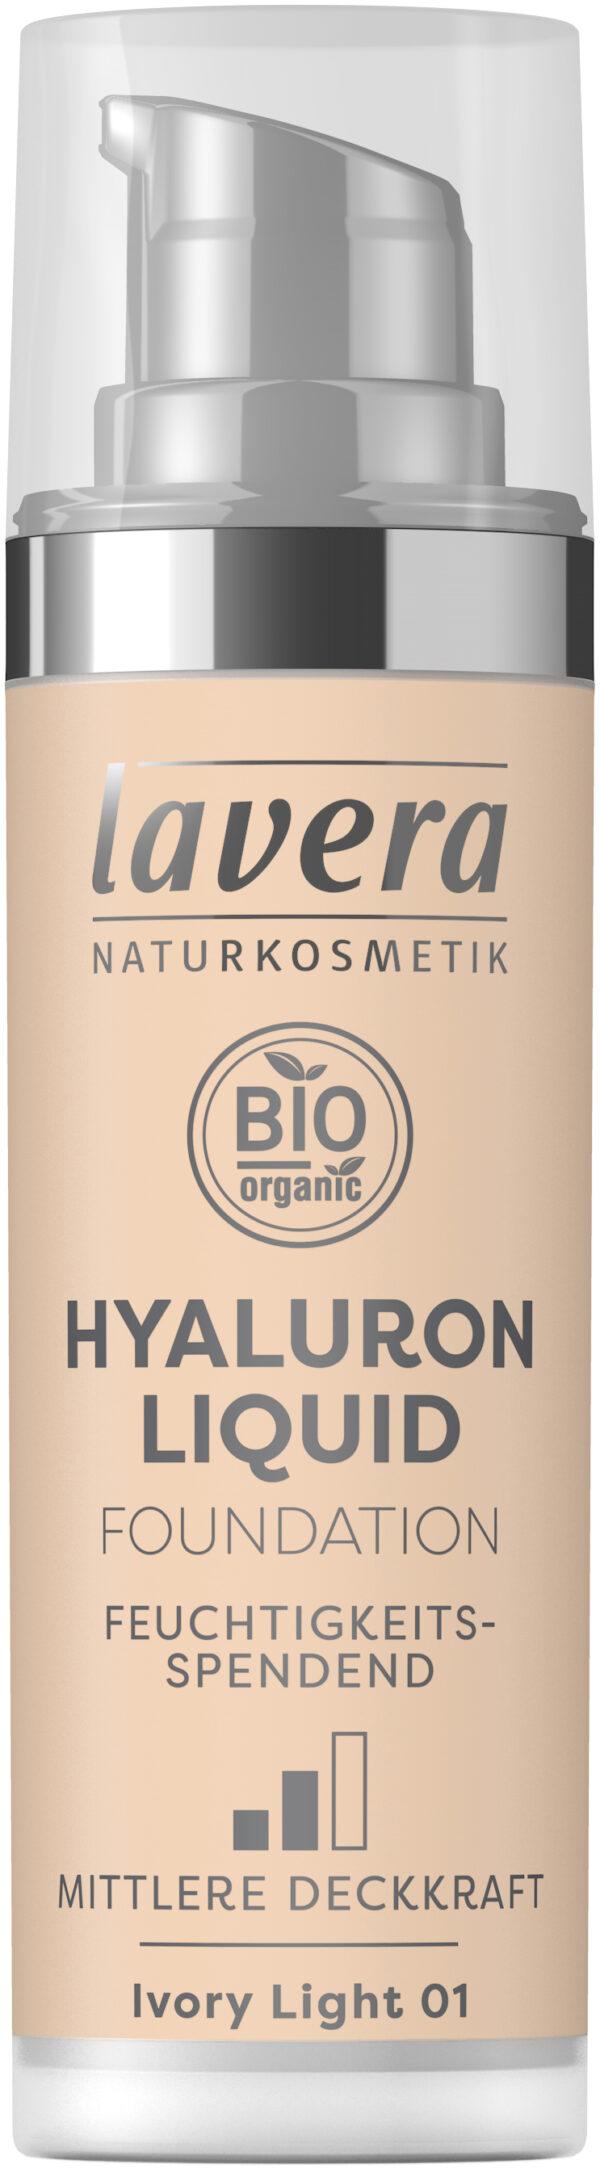 lavera HYALURON LIQUID FOUNDATION -Ivory Light 01- 30ml